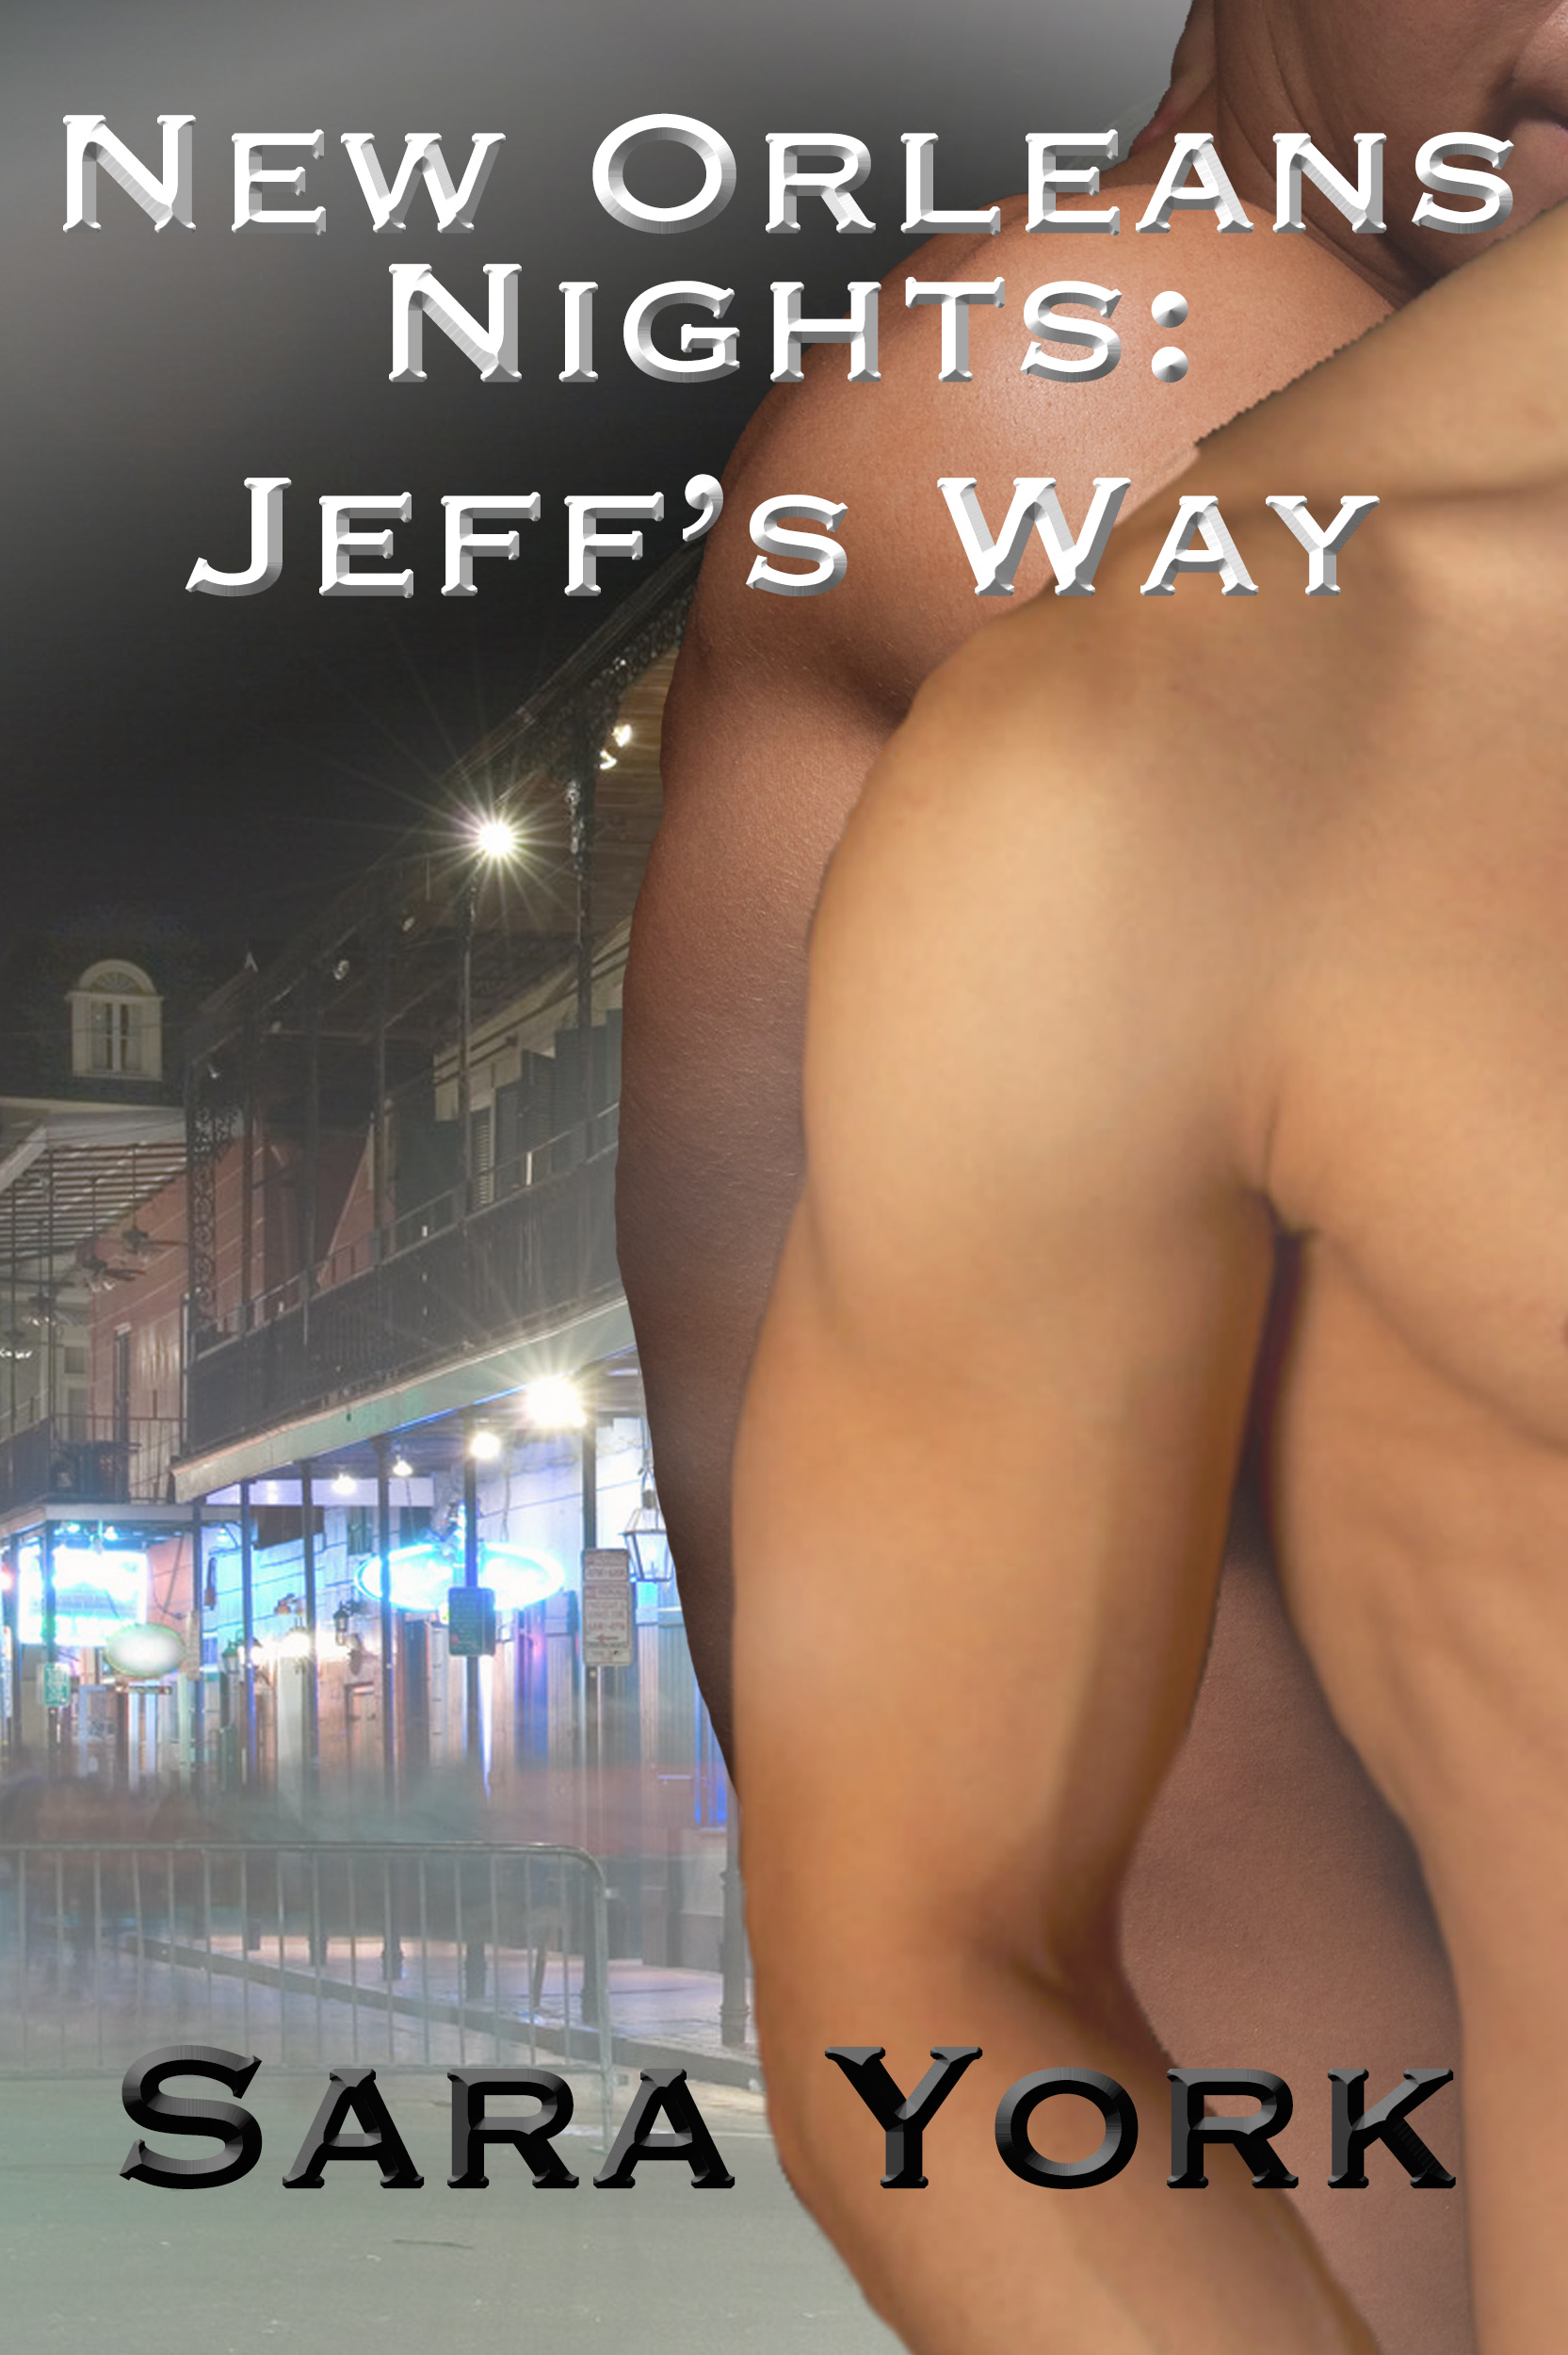 Sara York - New Orleans Nights: Jeff's Way